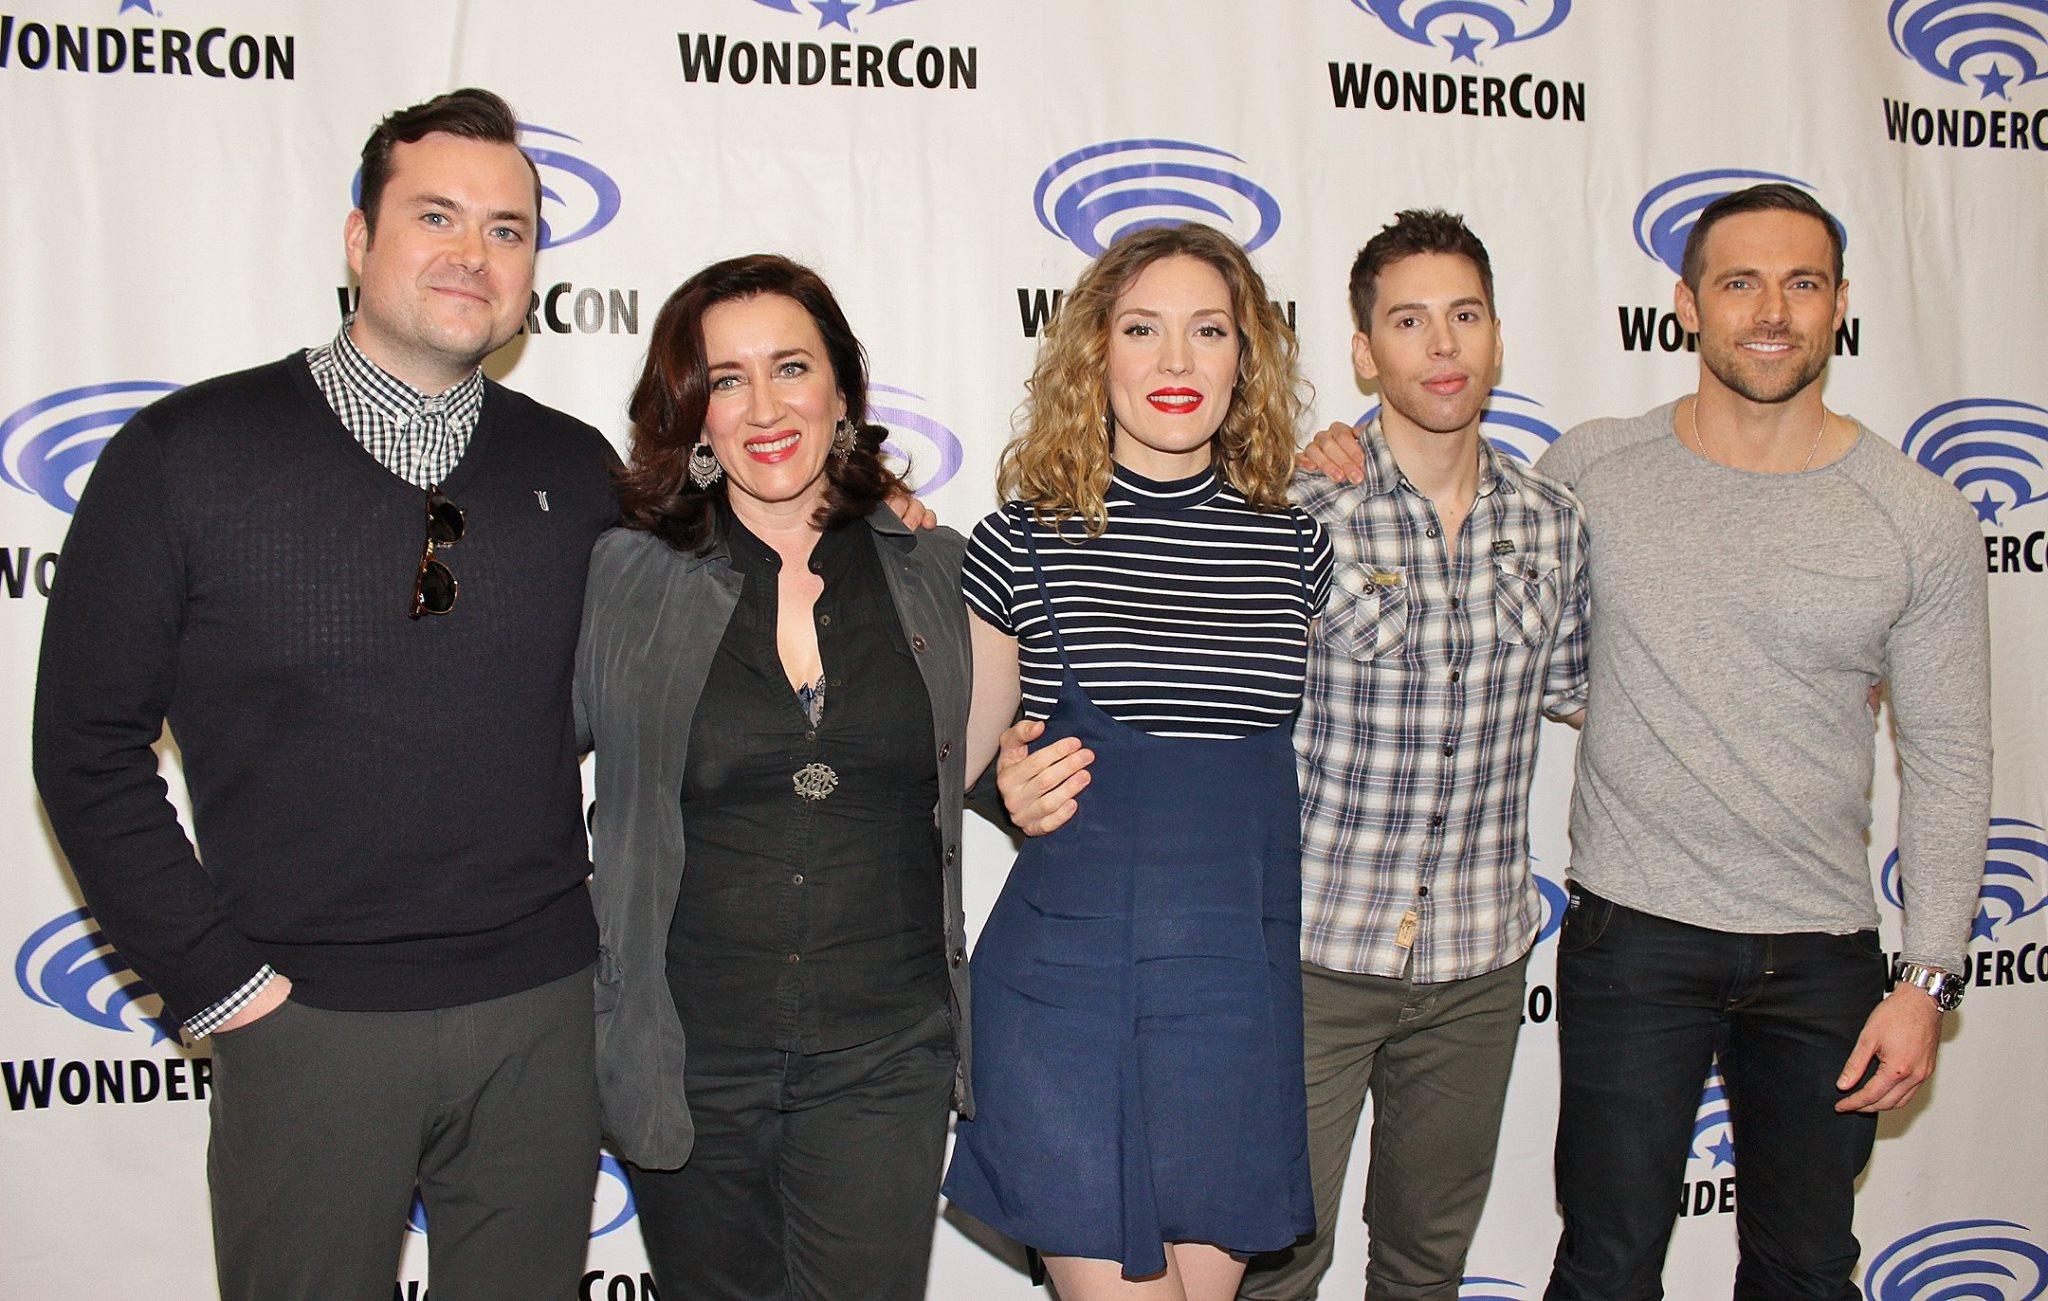 El elenco que acompaña a los clones de Tatiana Maslany en 'Orphan Black'